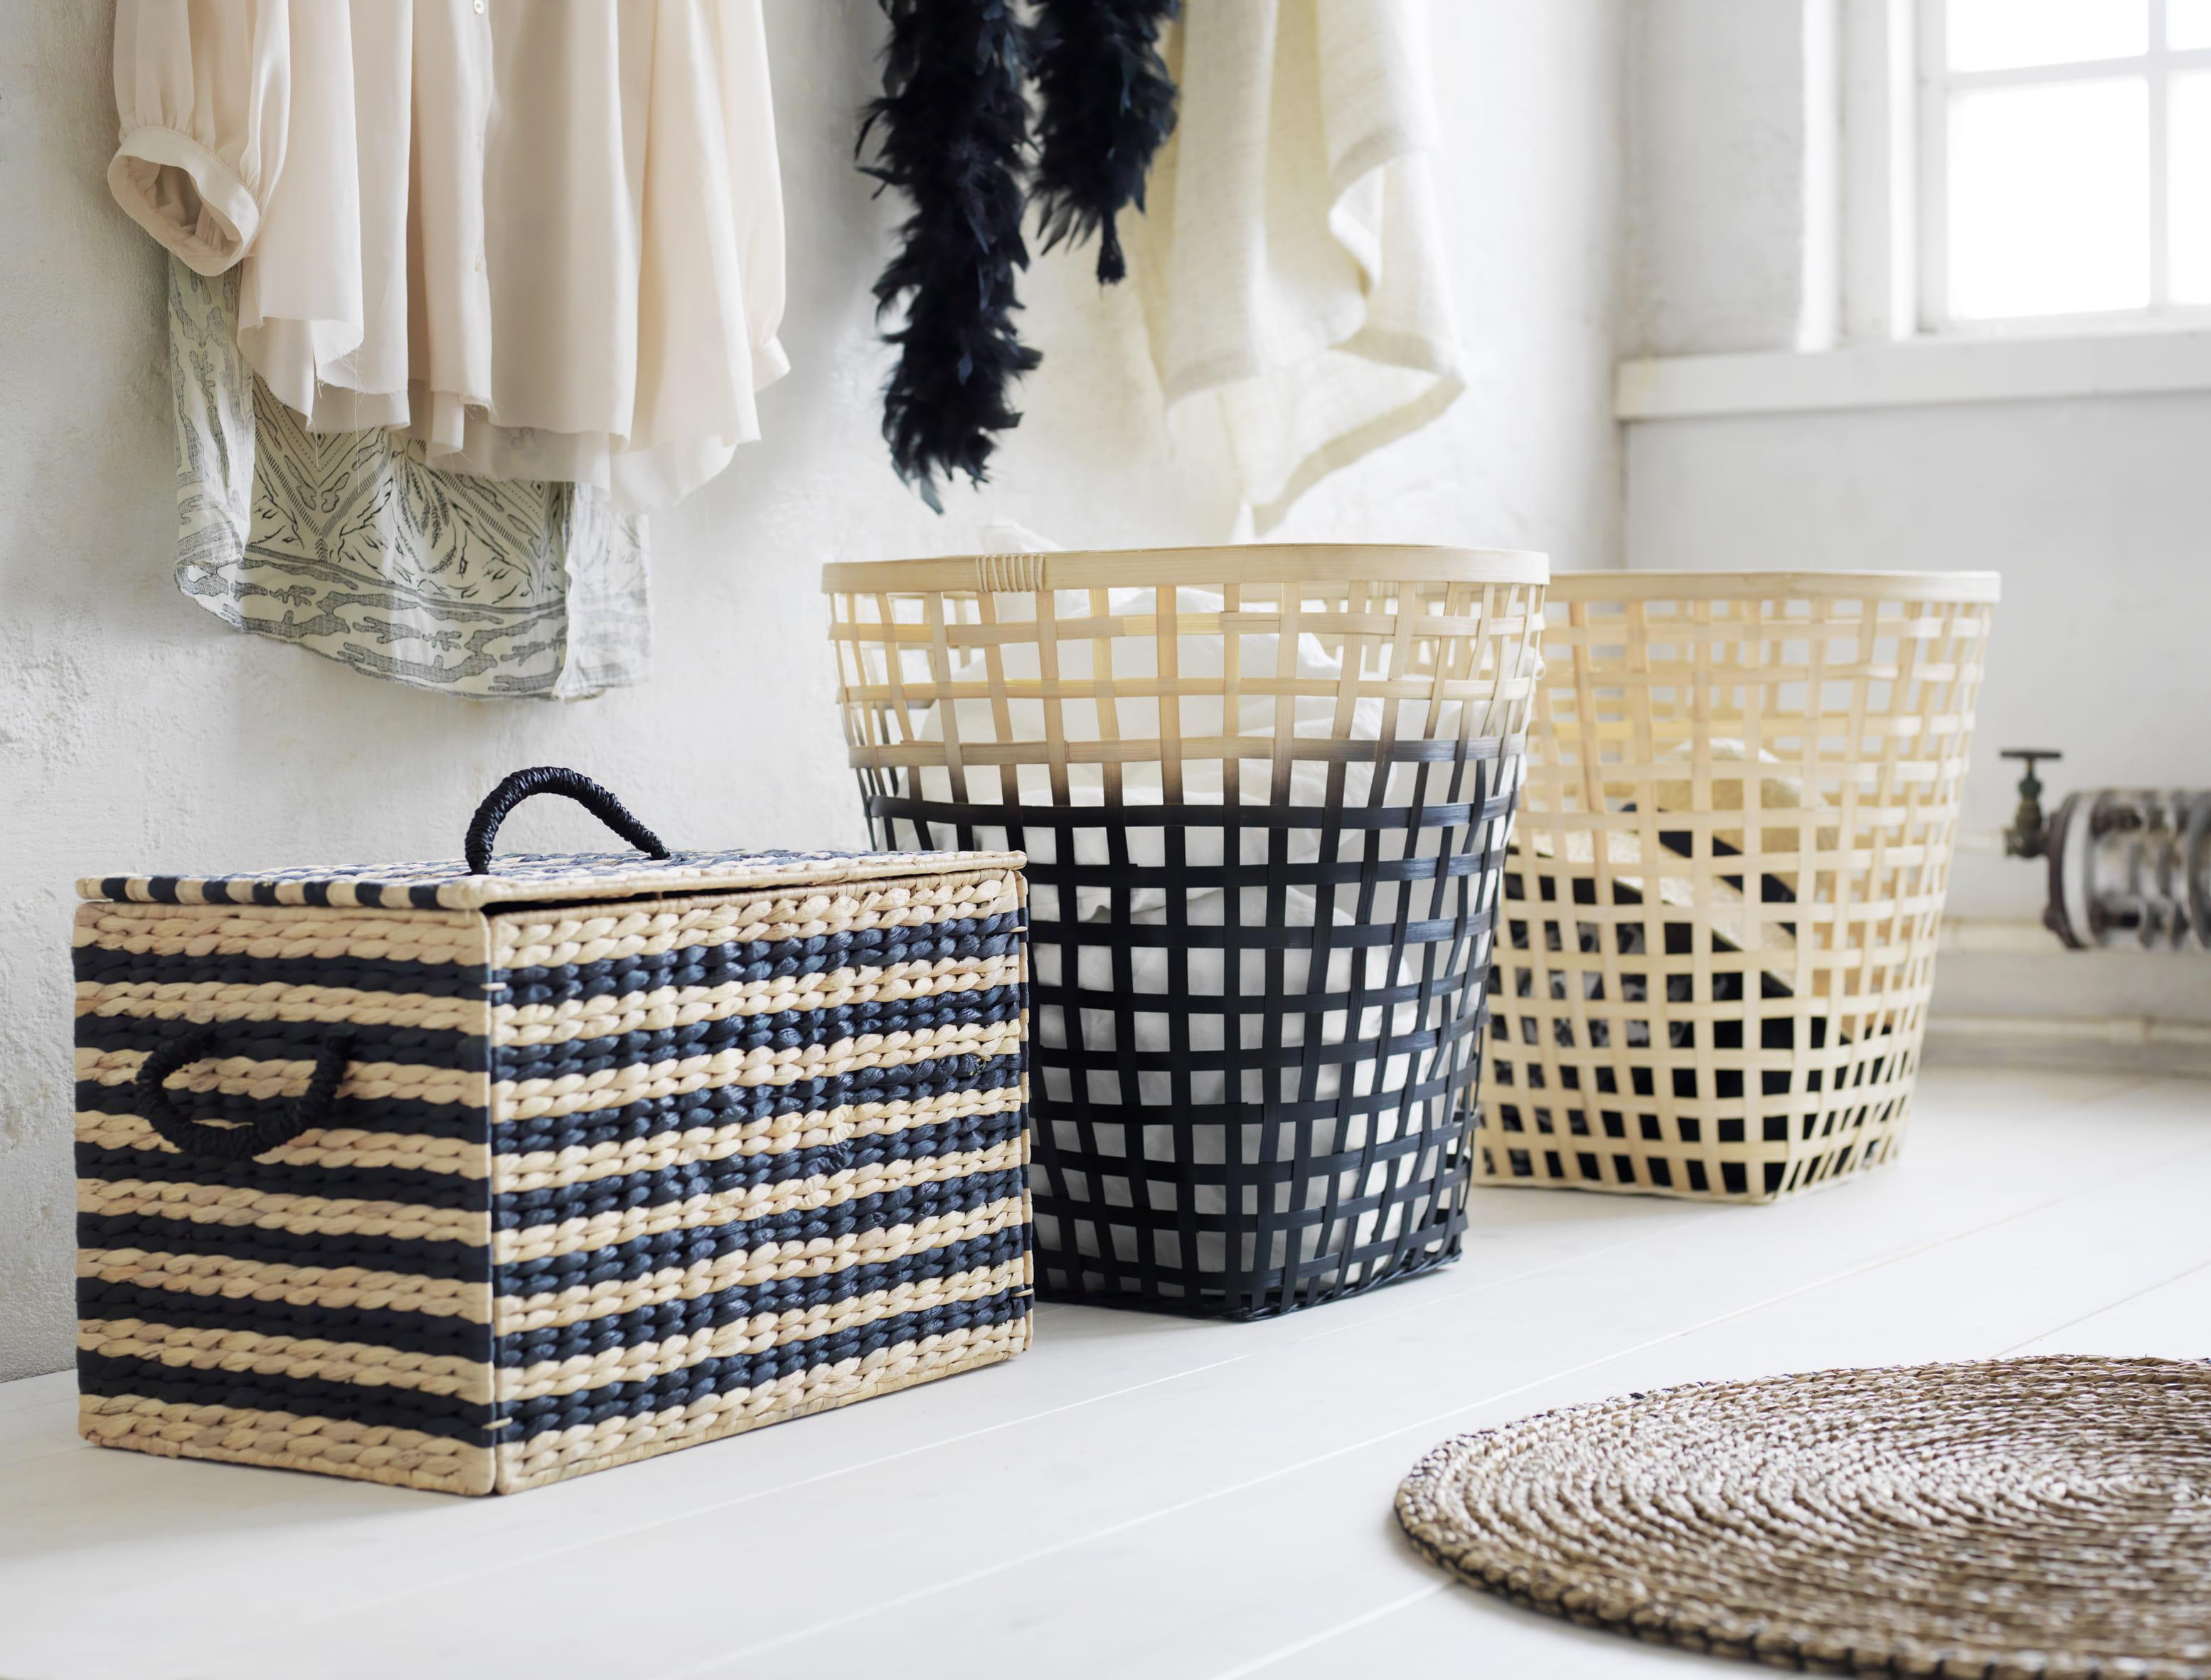 bo te de rangement nipprig ikea rotin et fibres naturelles pour la collection printemps d 39 ikea. Black Bedroom Furniture Sets. Home Design Ideas